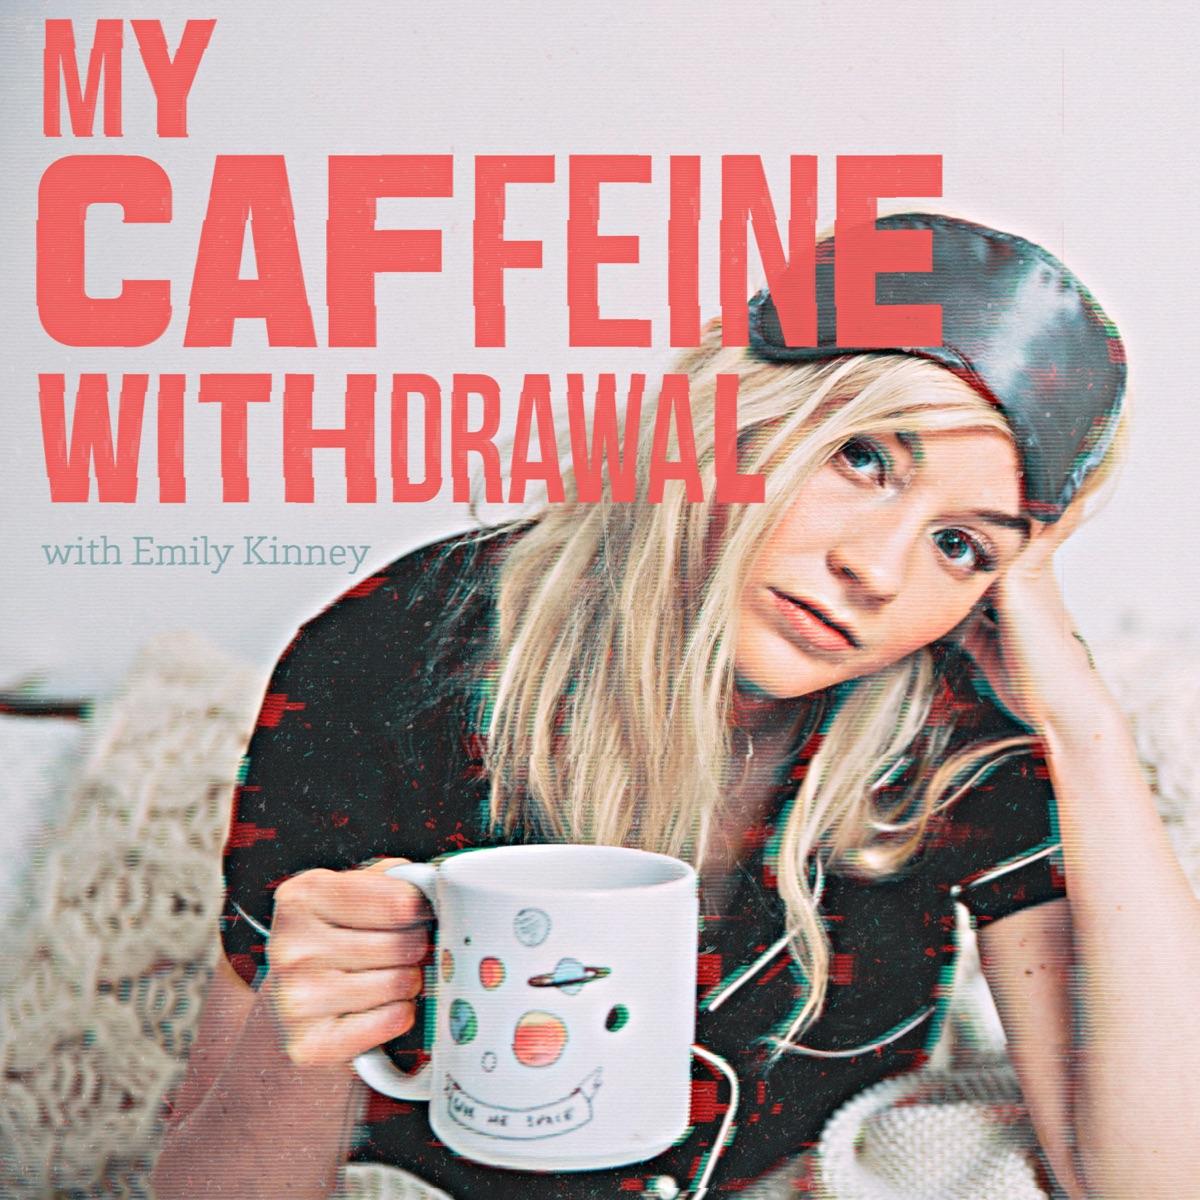 My Caffeine Withdrawal with Emily Kinney